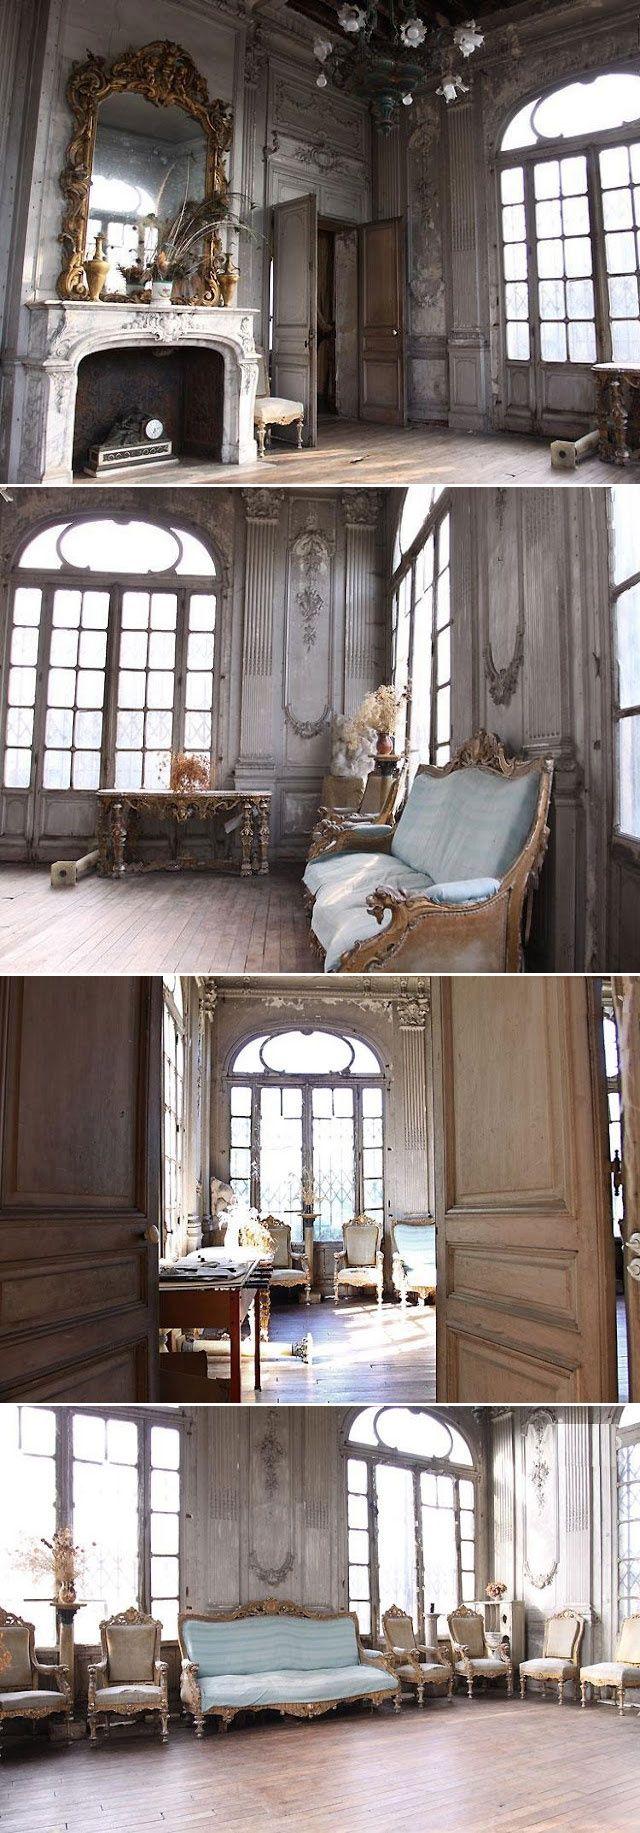 Gold and brass fixtures and faucets promising or passe apartment -  Pantina Ballroom Wedding 18th Century Patina Abandoned Ballroom